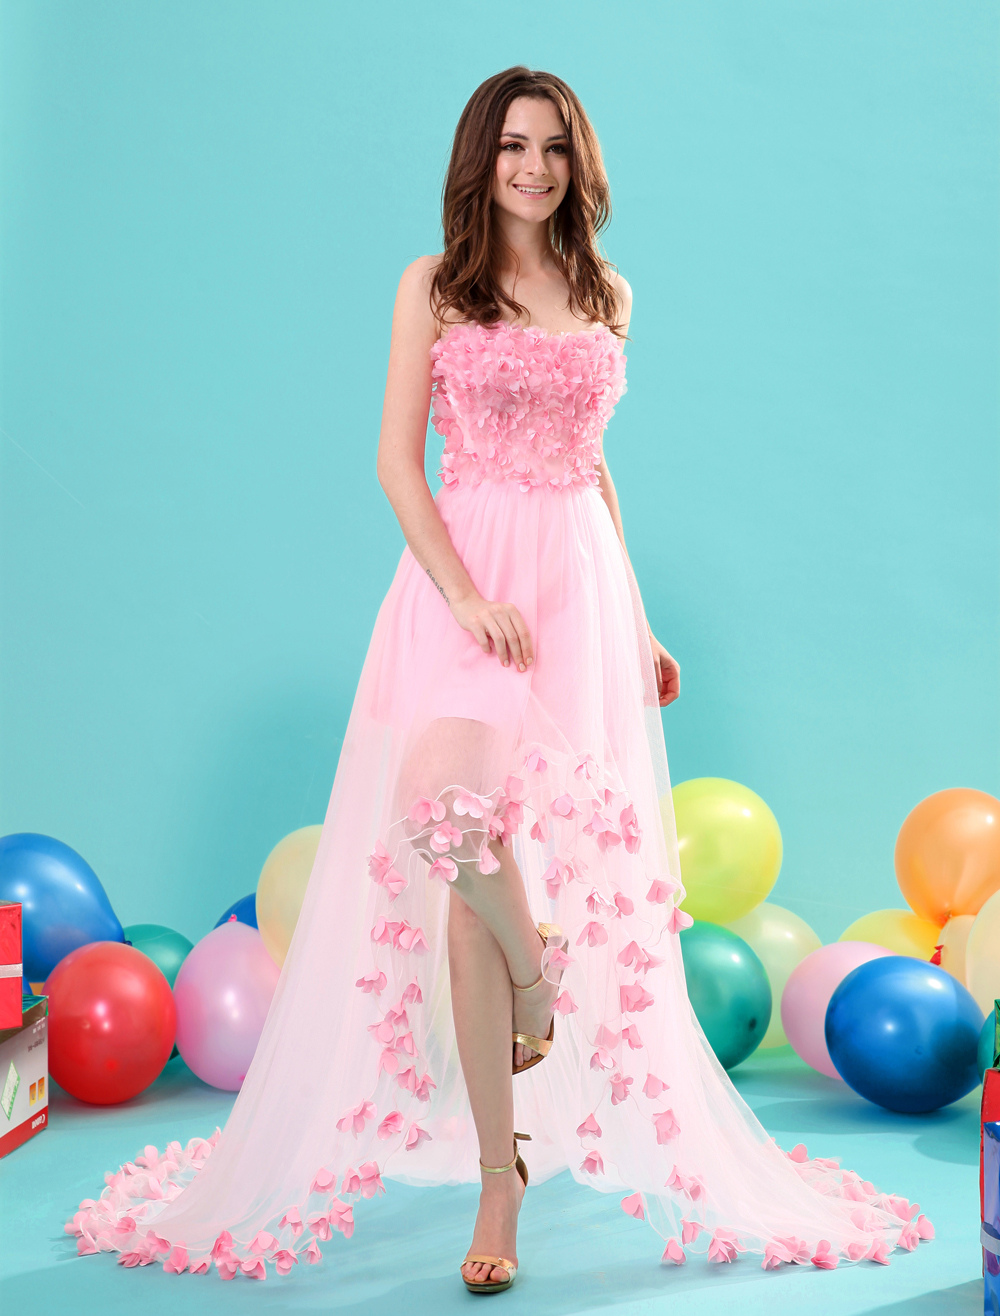 Pink Strapless High-low Flower Prom Dress Milanoo (Wedding Prom Dresses) photo